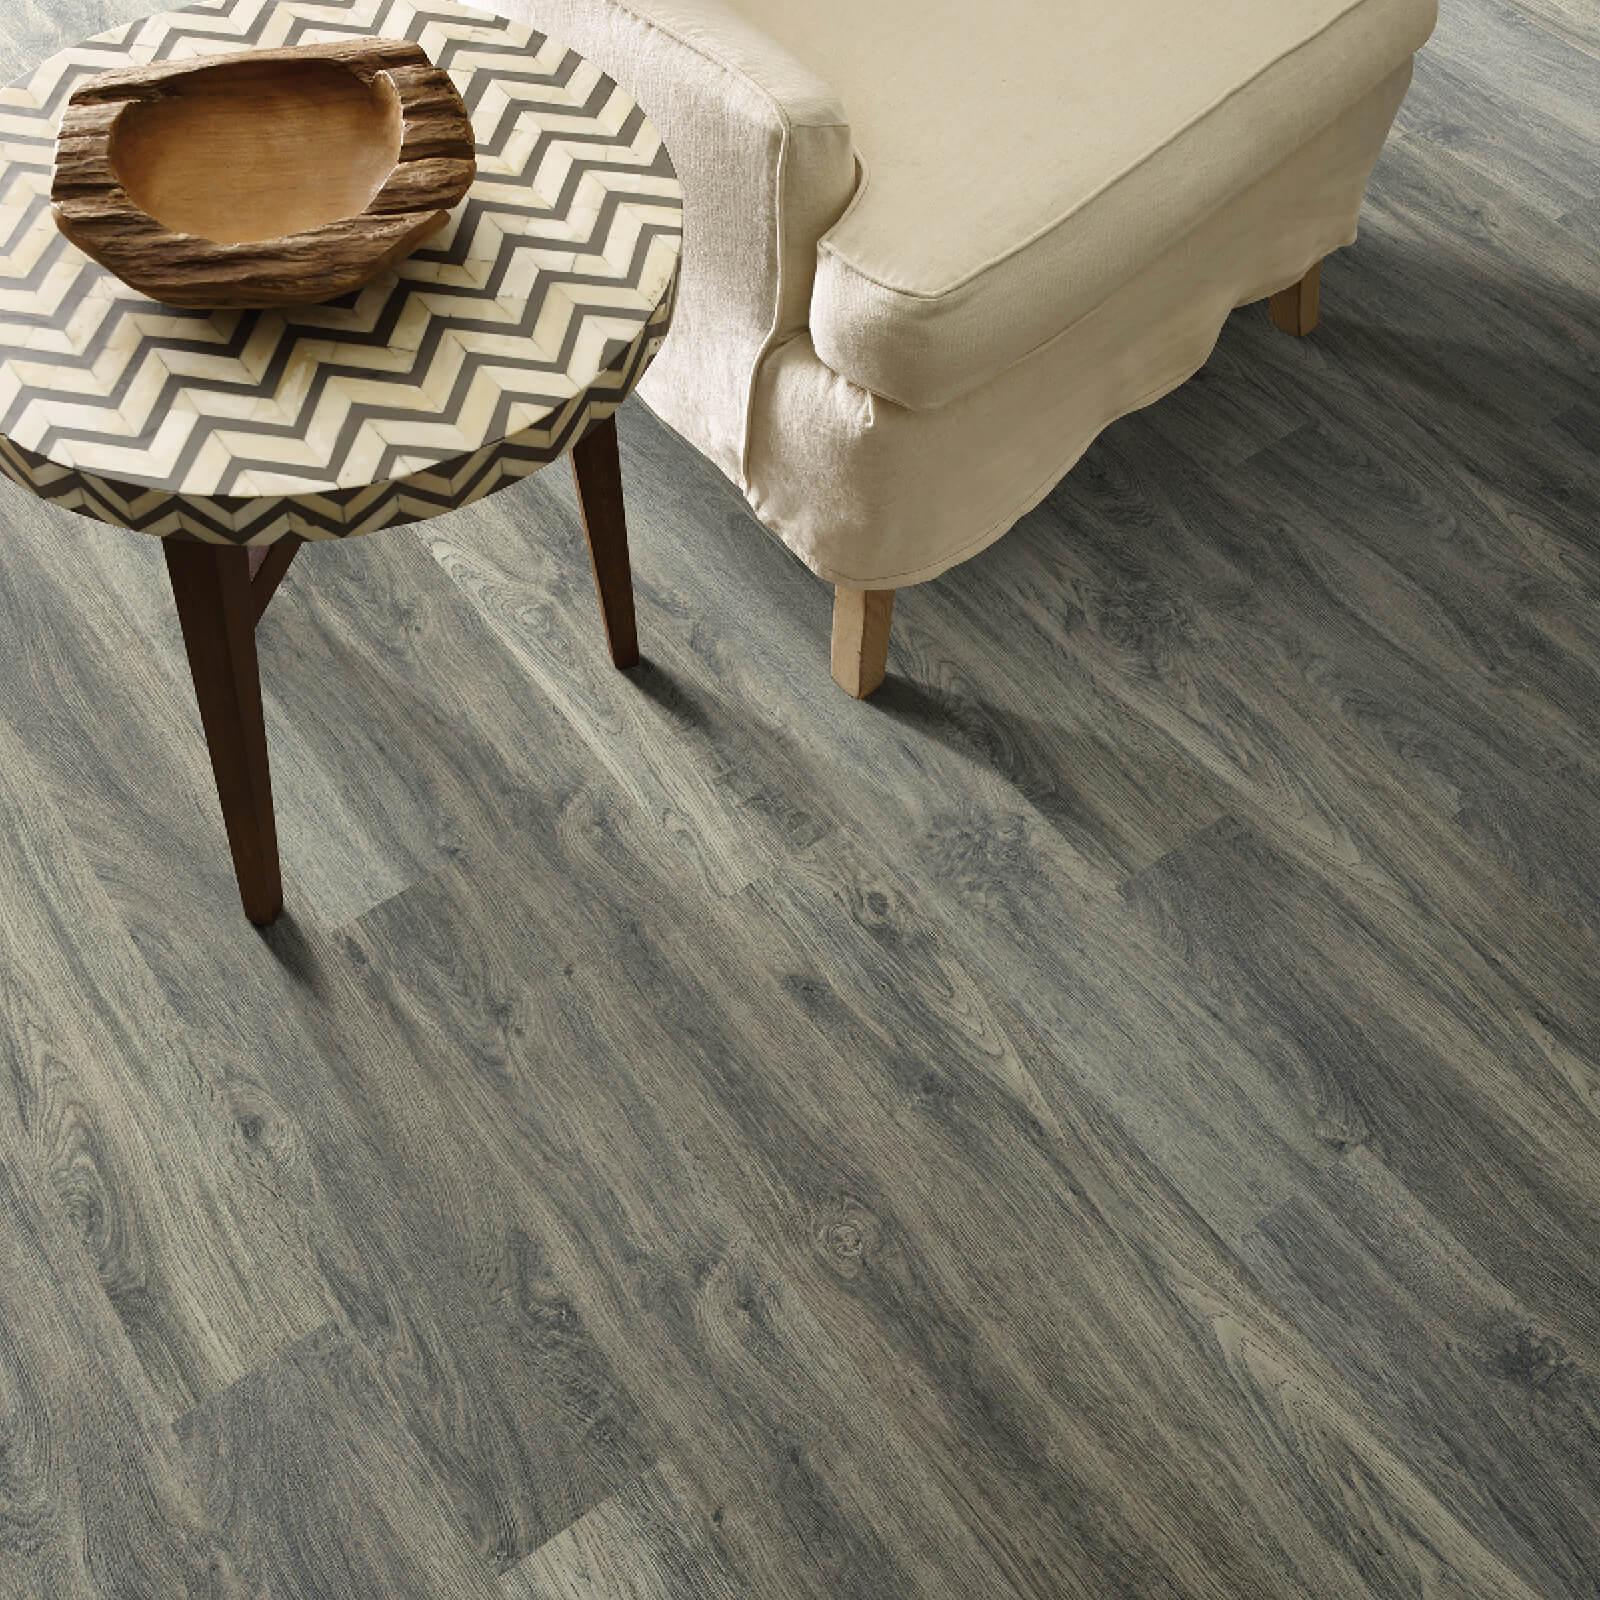 Laminate Flooring Dartmouth, NS | Wacky's Flooring